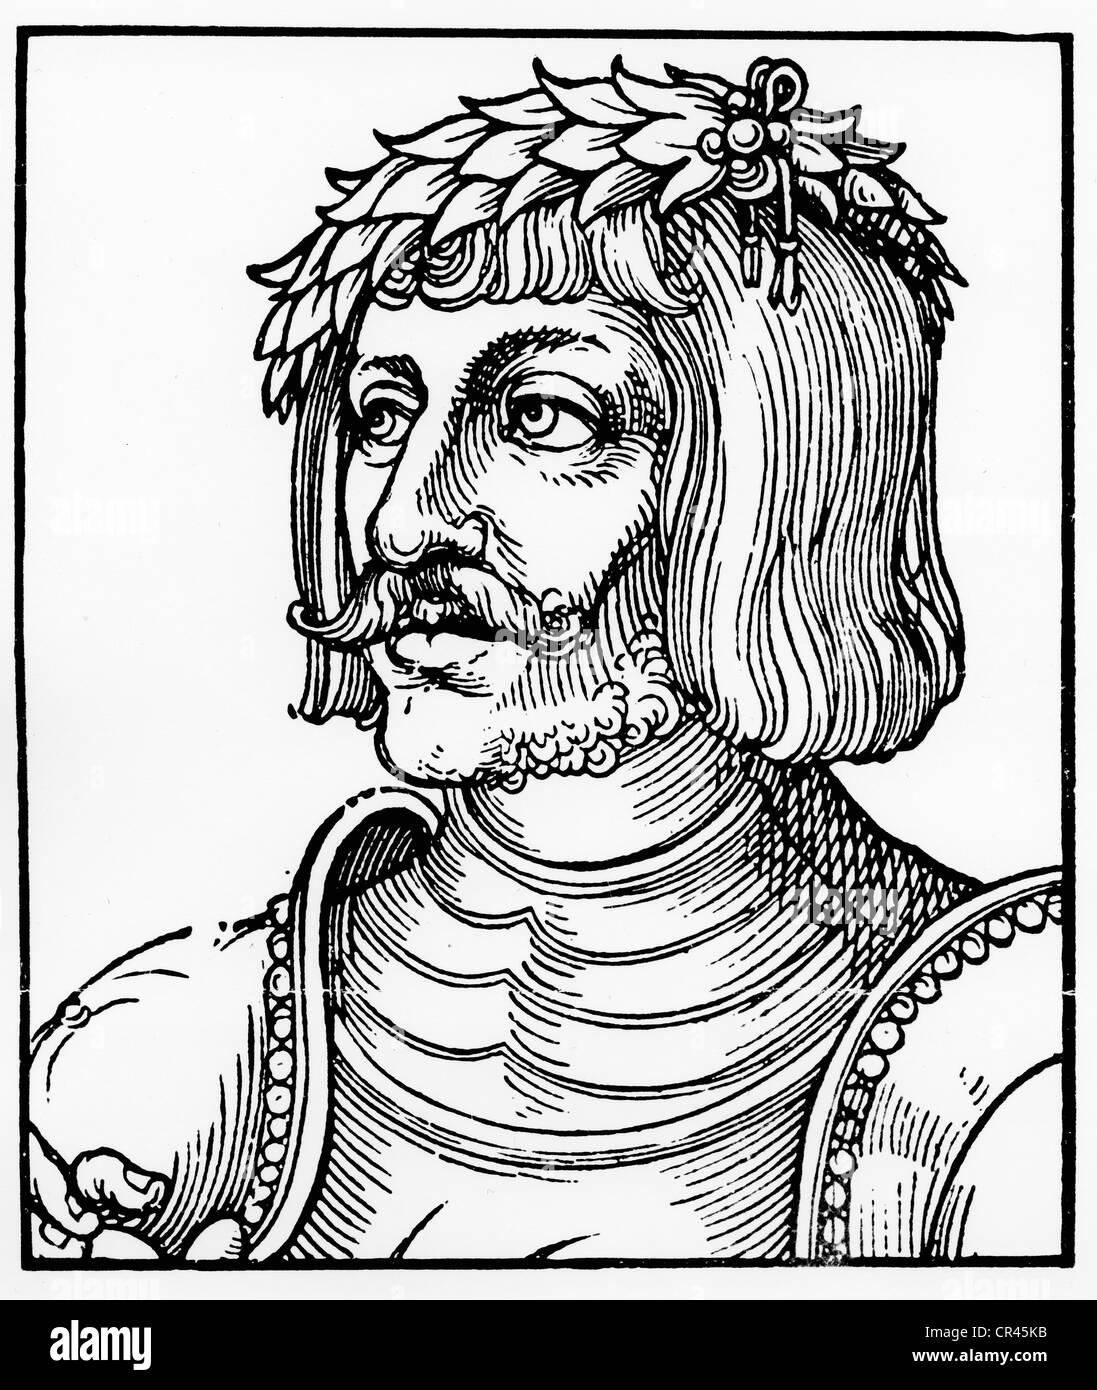 Ulrich von Hutten, 1488-1523, historical wood carving by Erhard Schoen, ca. 1522 - Stock Image